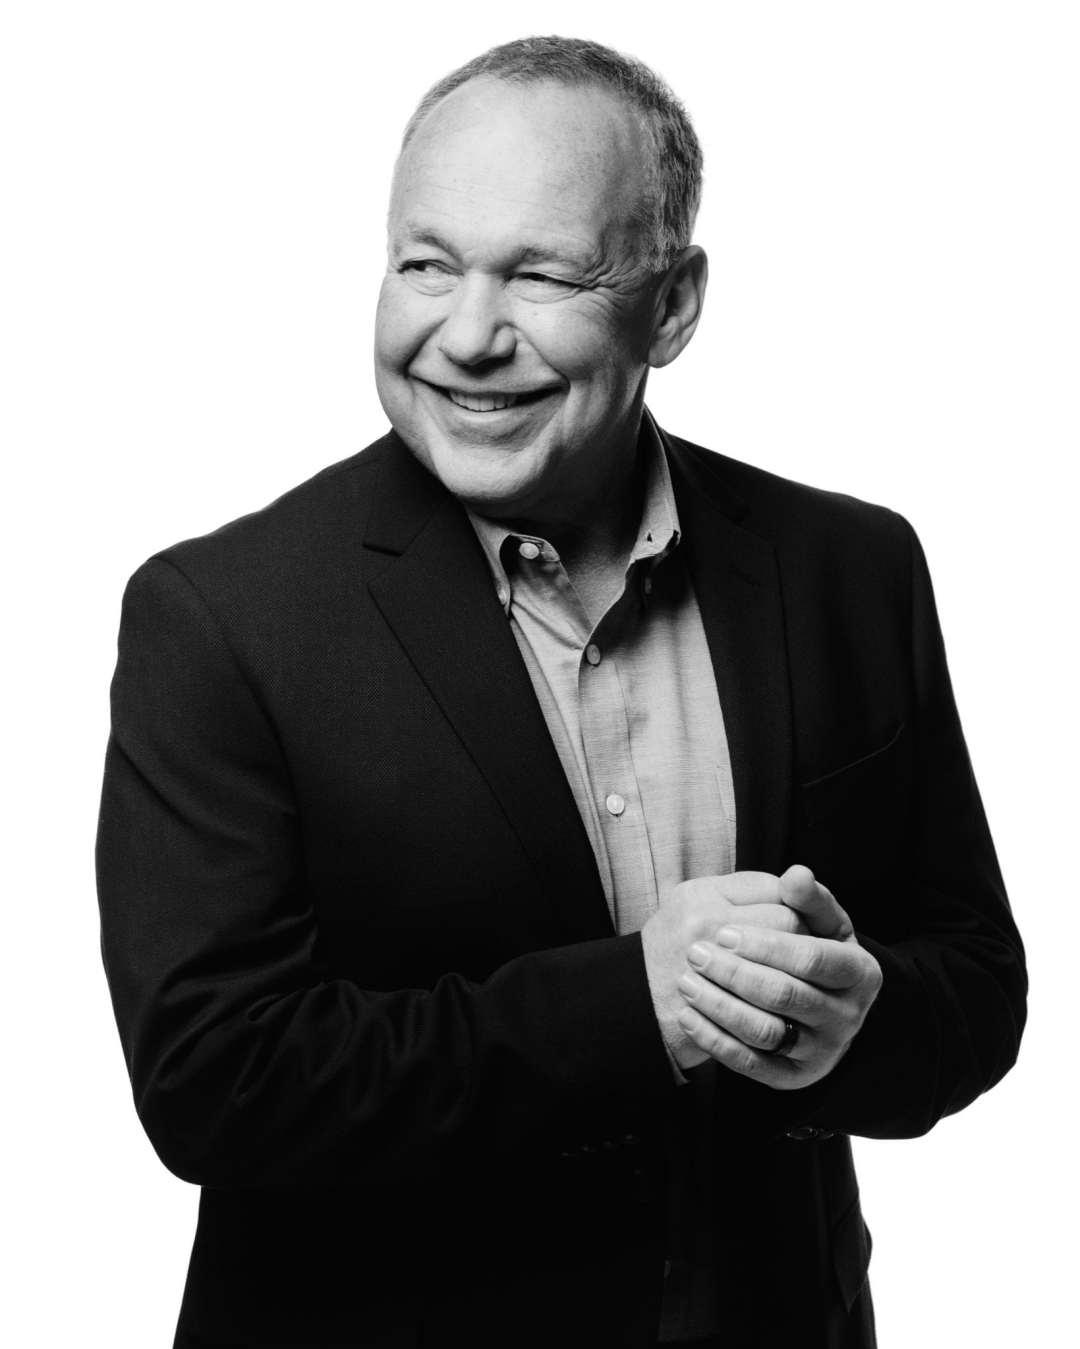 Jim Heilman